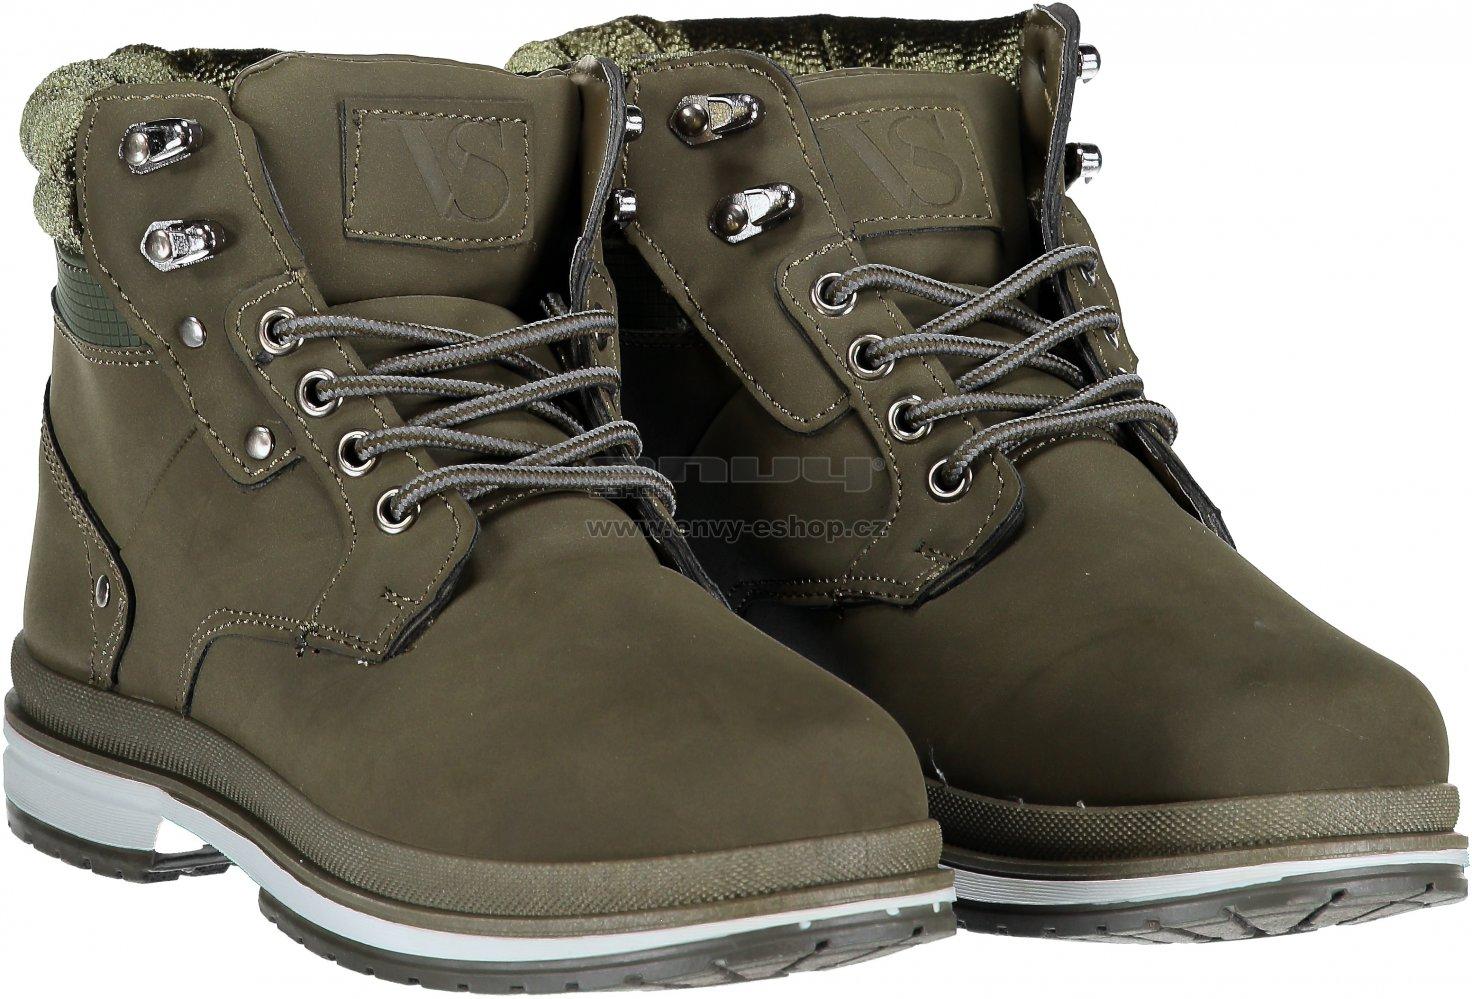 65730d136c5 Dámské boty VICES JB008-29 OLIVE GREEN velikost  36   ENVY-ESHOP.cz